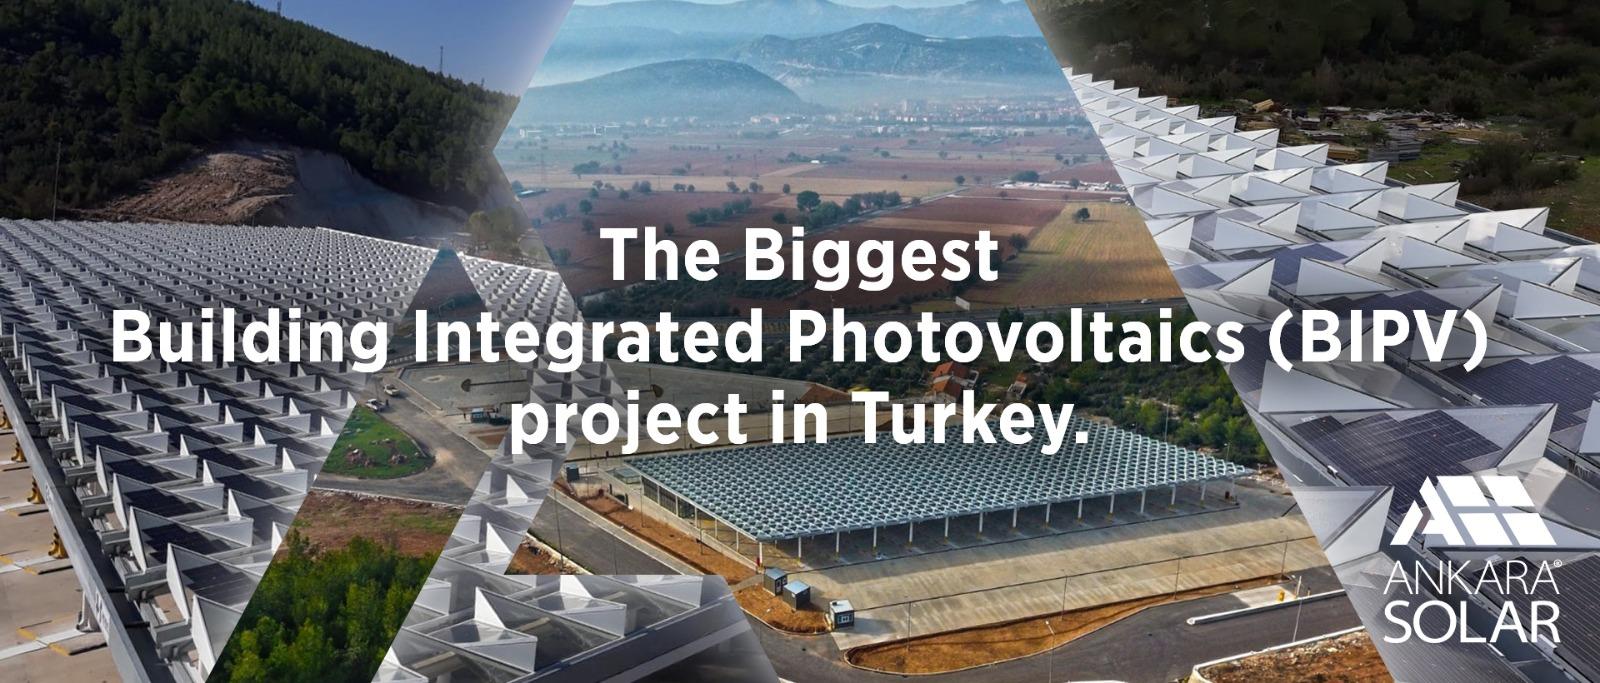 Ankara Solar - Photovoltaic (PV) Solar Energy Solutions , Turkey's